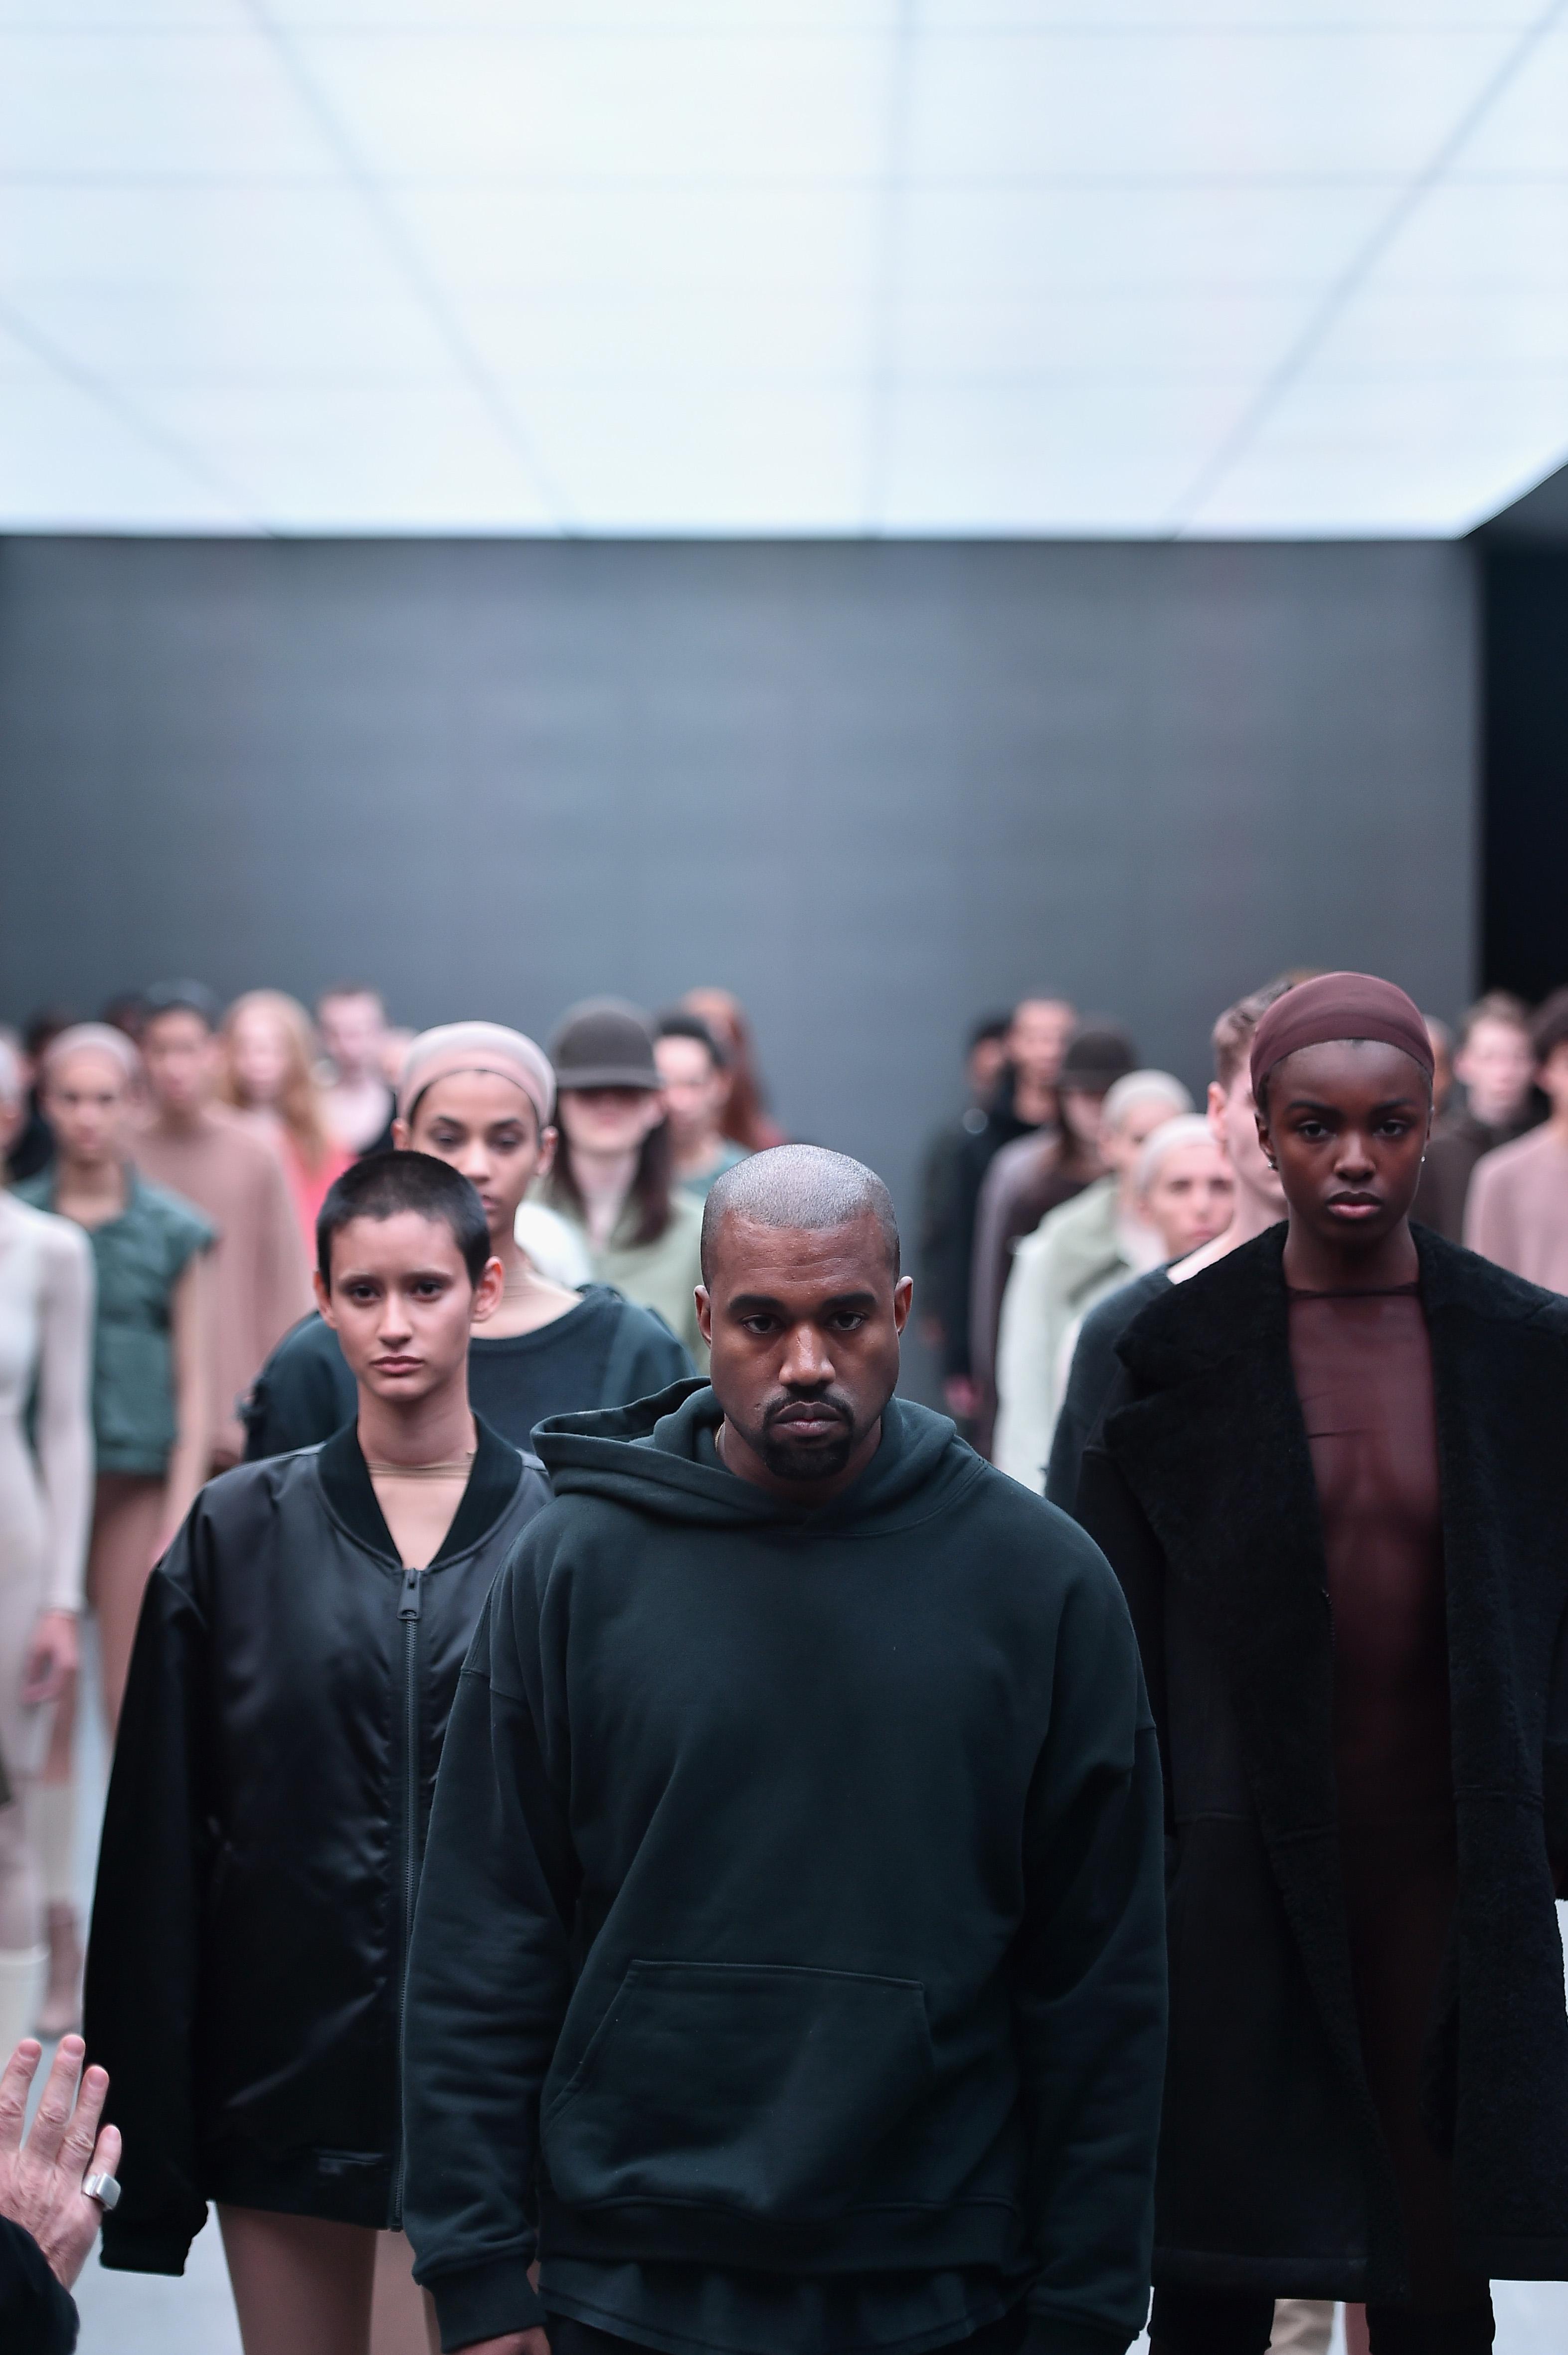 Kanye's Last-Minute Yeezy Season 2 Presentation Is Wreaking Havoc